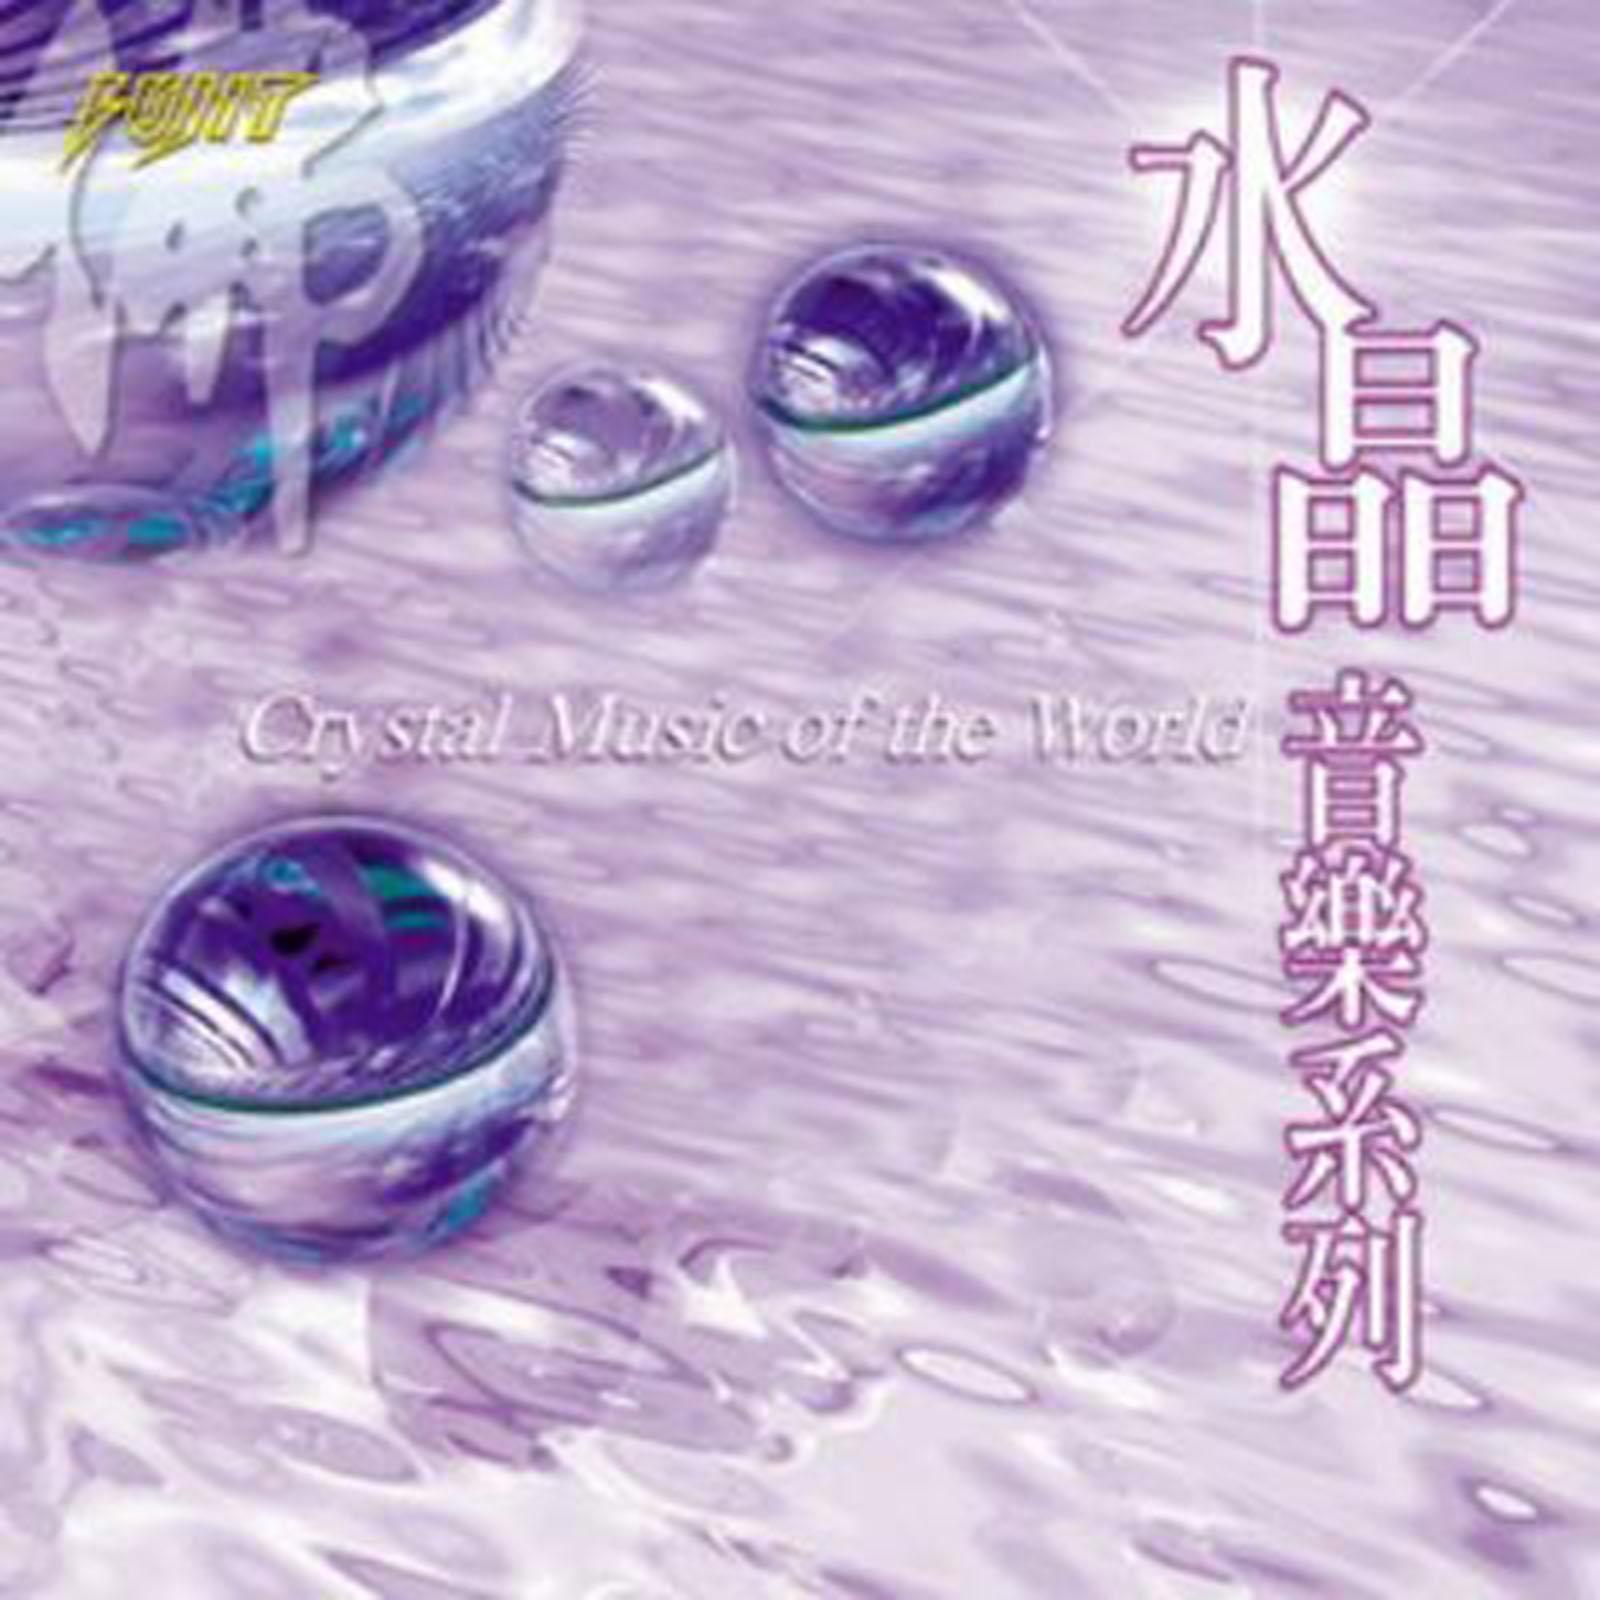 水晶音樂系列 1 : Crystal Music of the World 1 專輯封面